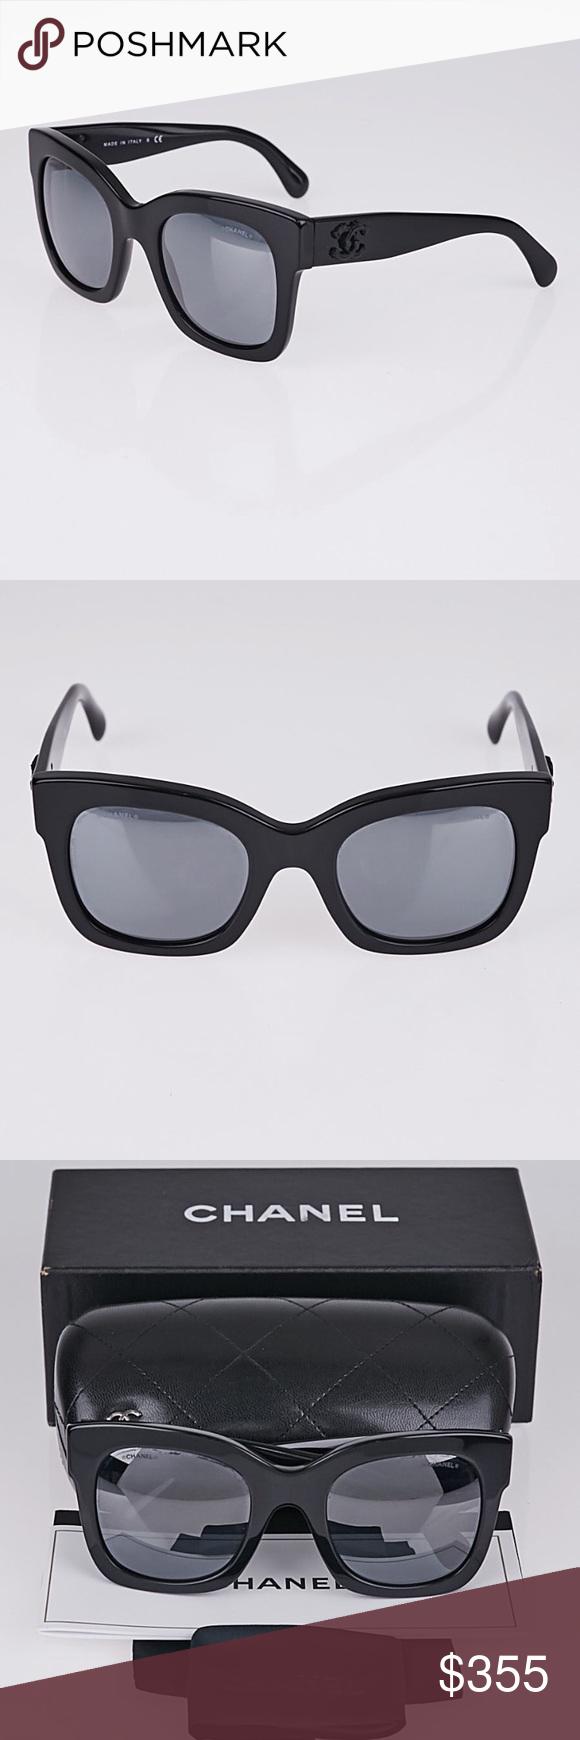 abcce61472 CHANEL 5357 C501/26 BLACK/DARK GREY-SILVER MIRROR 100% Authentic Chanel